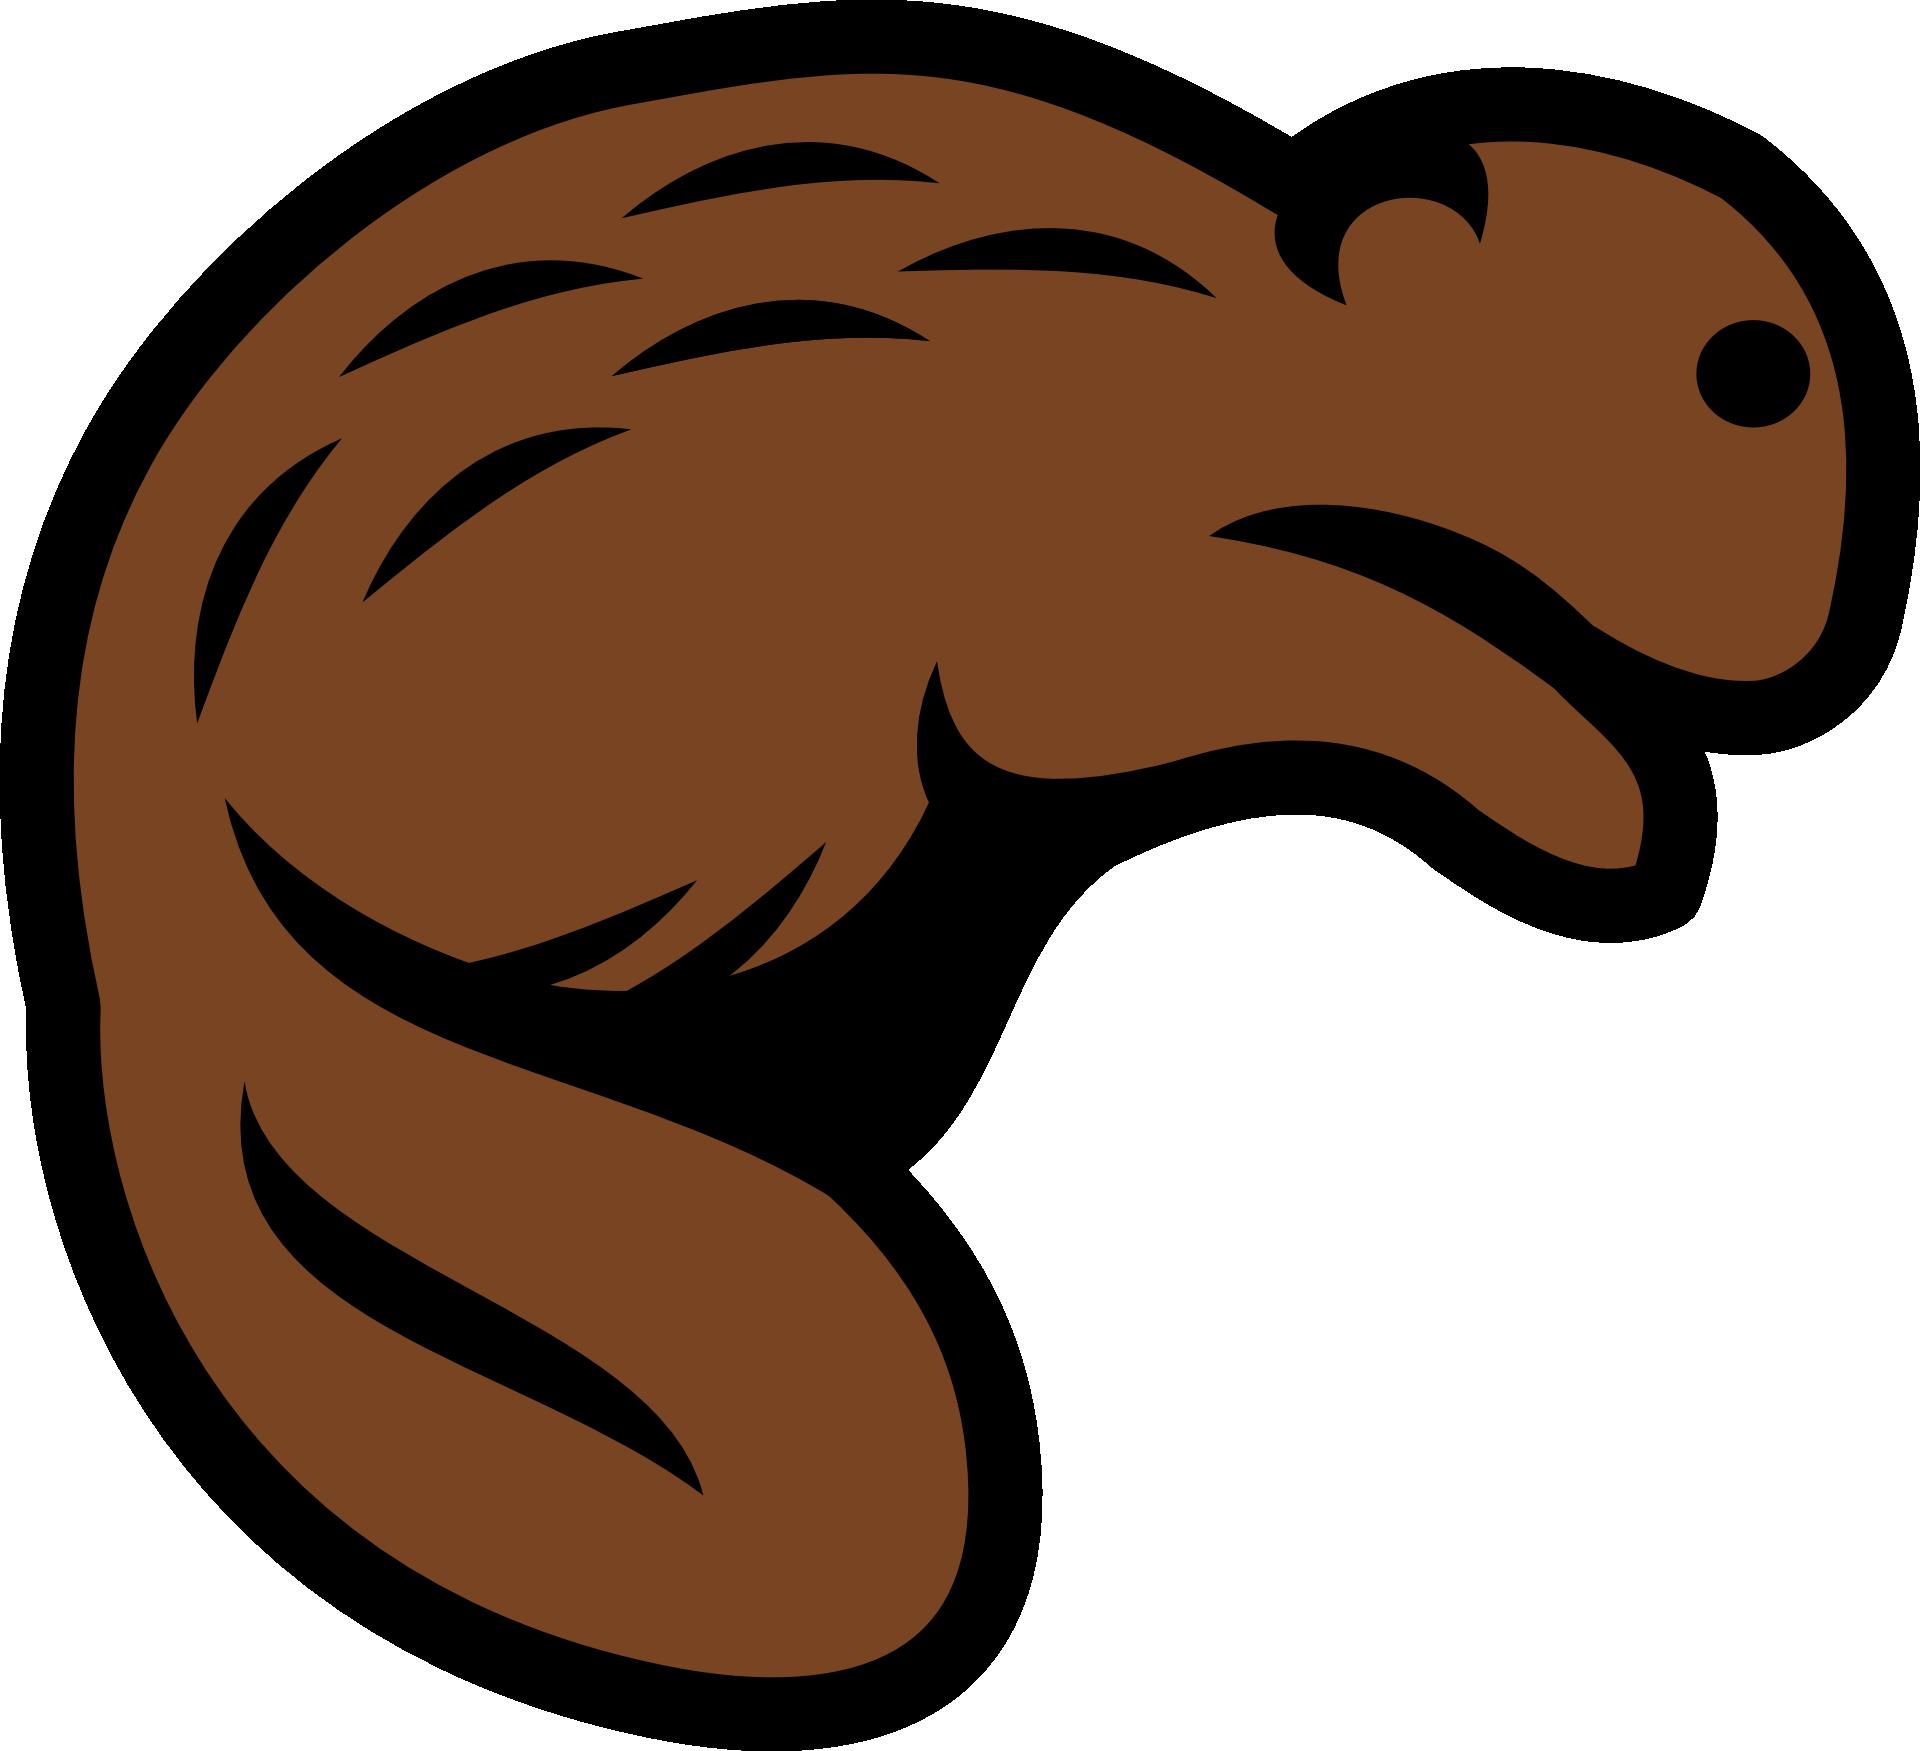 image library stock Beaver fur clip art. Trade clipart